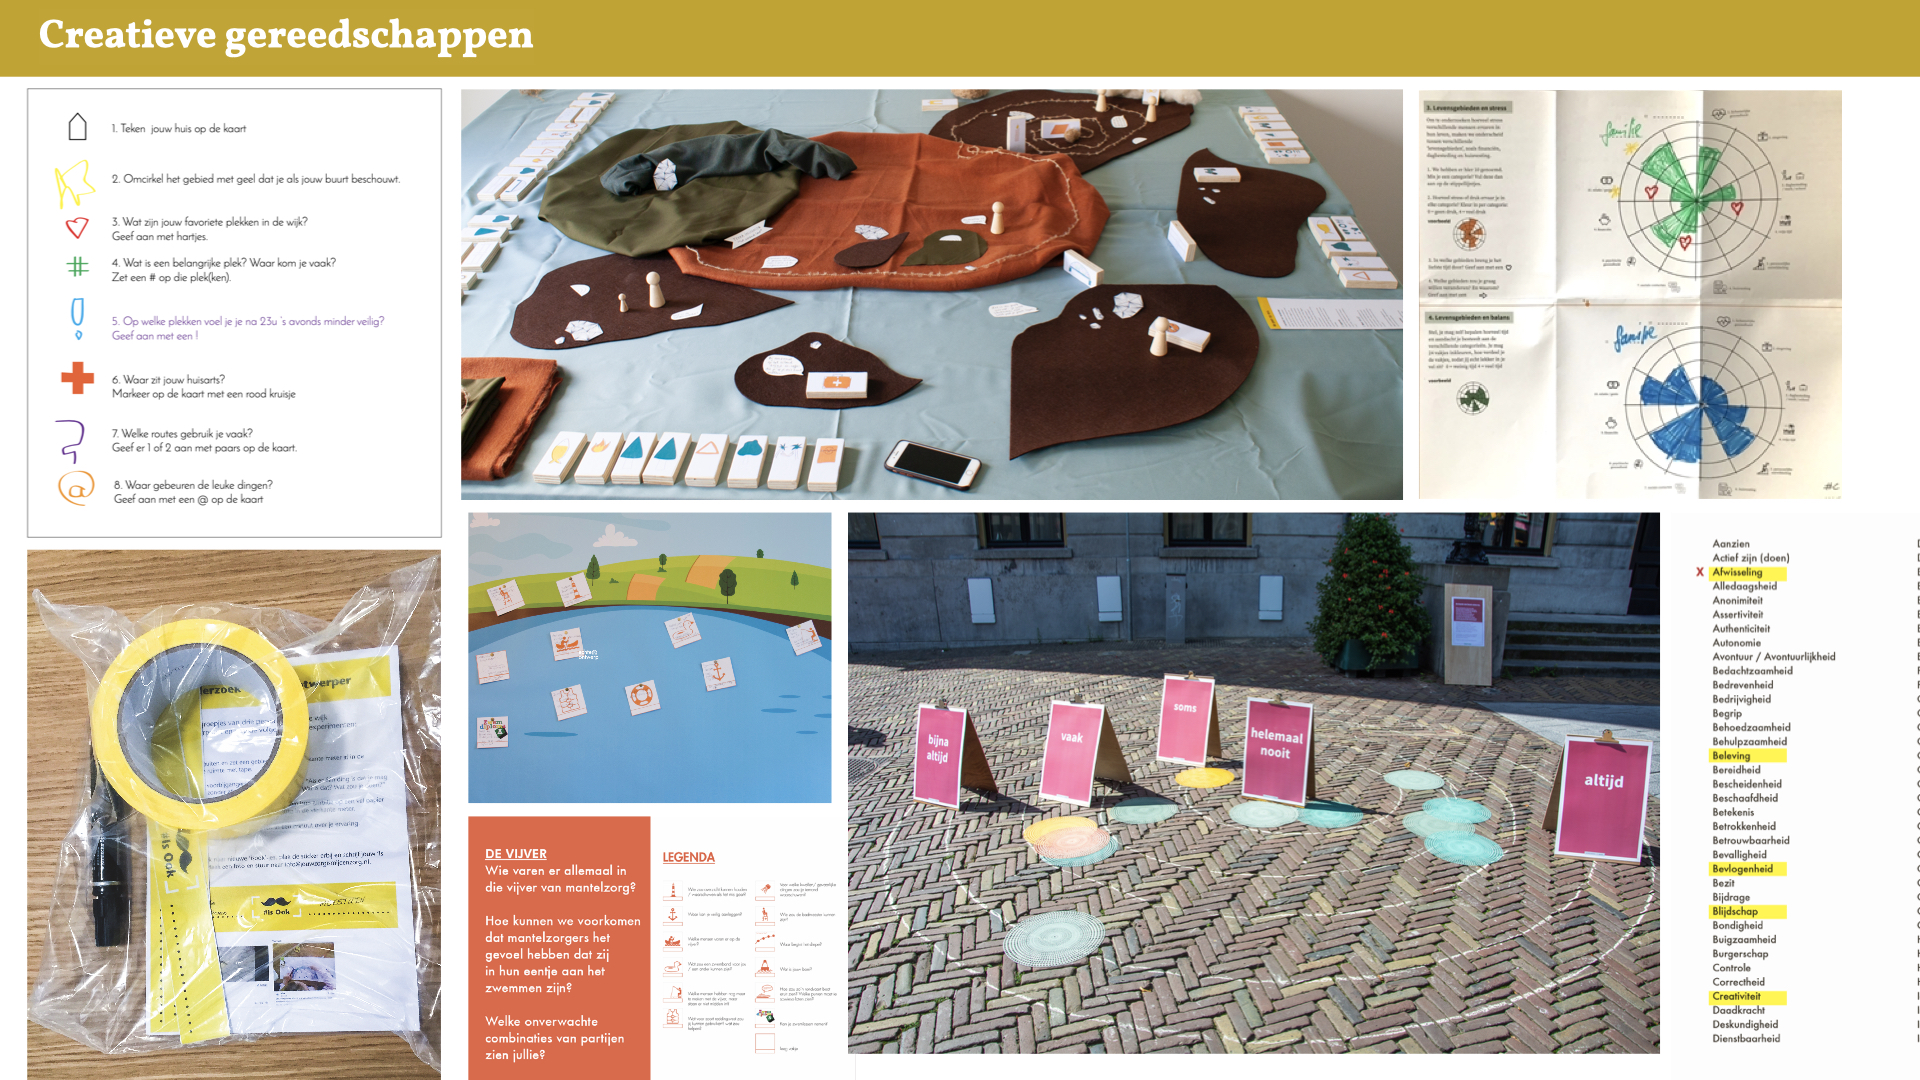 creatieve gereedschappen-echterontwerp-socialdesign-contextmapping